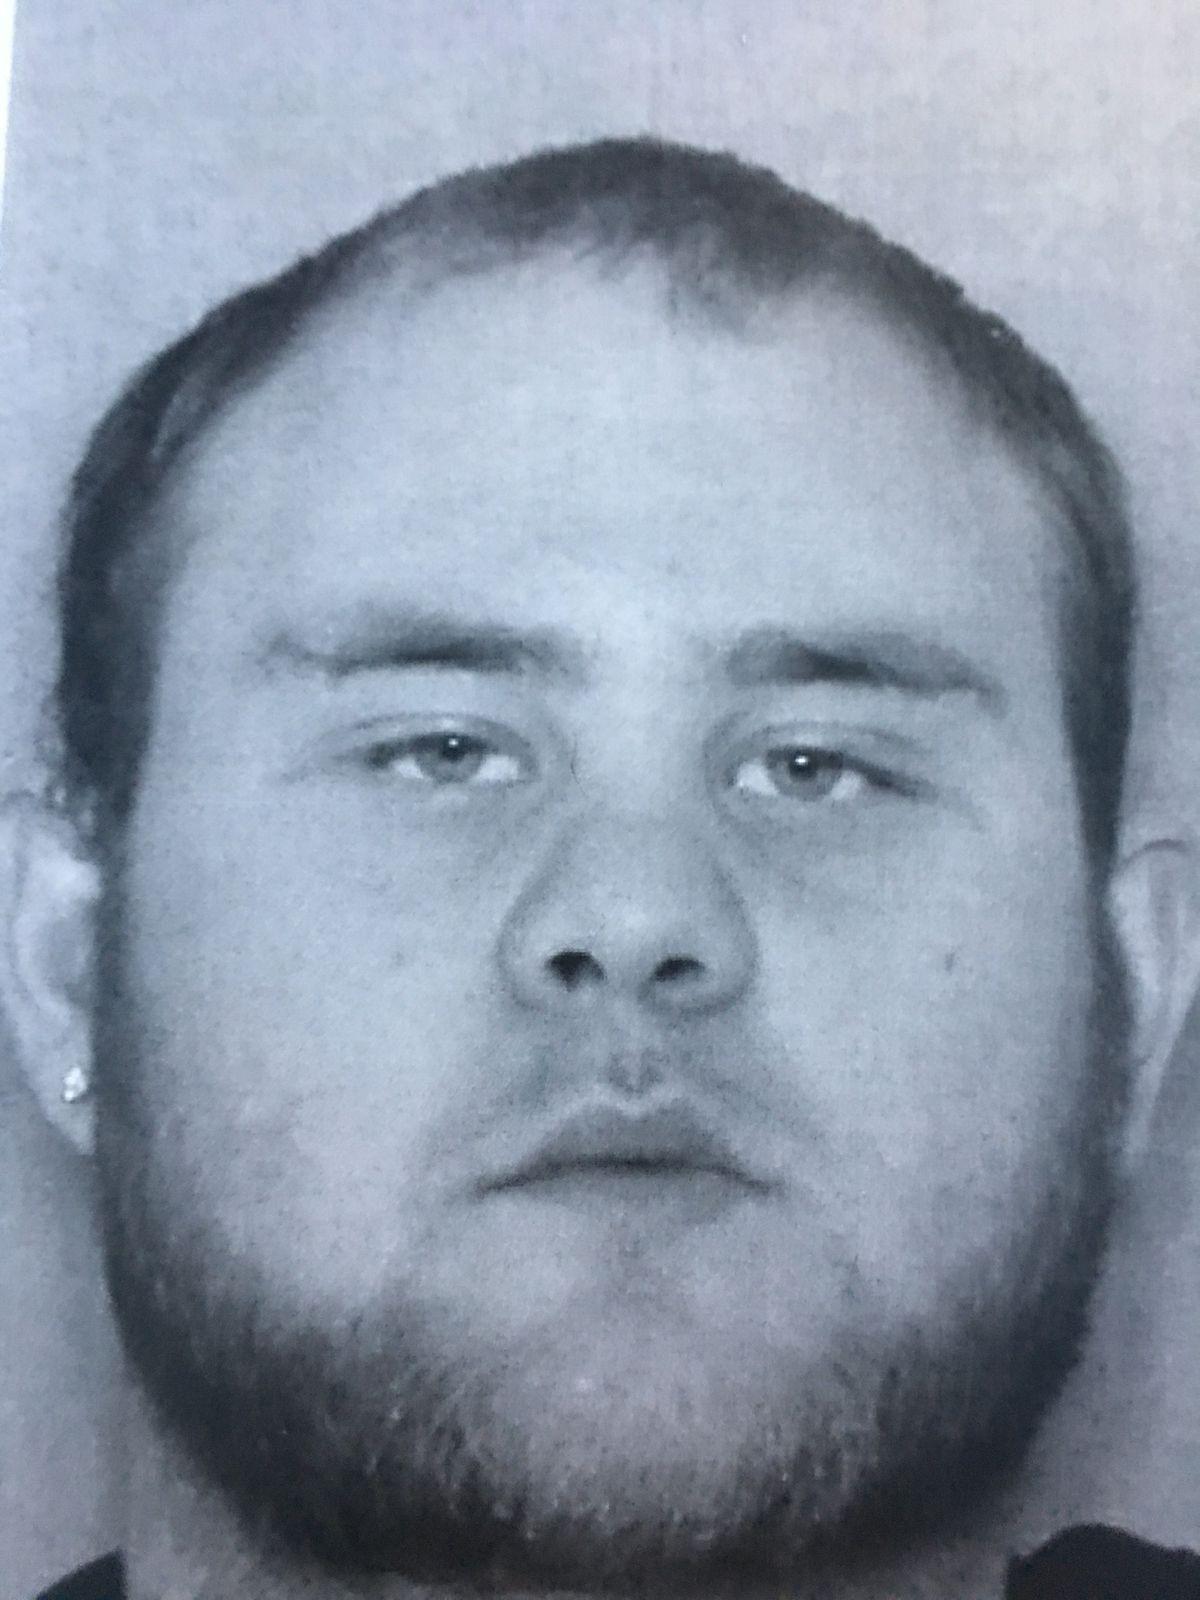 Third arrest made in murder of missing Sumter man   wltx.com